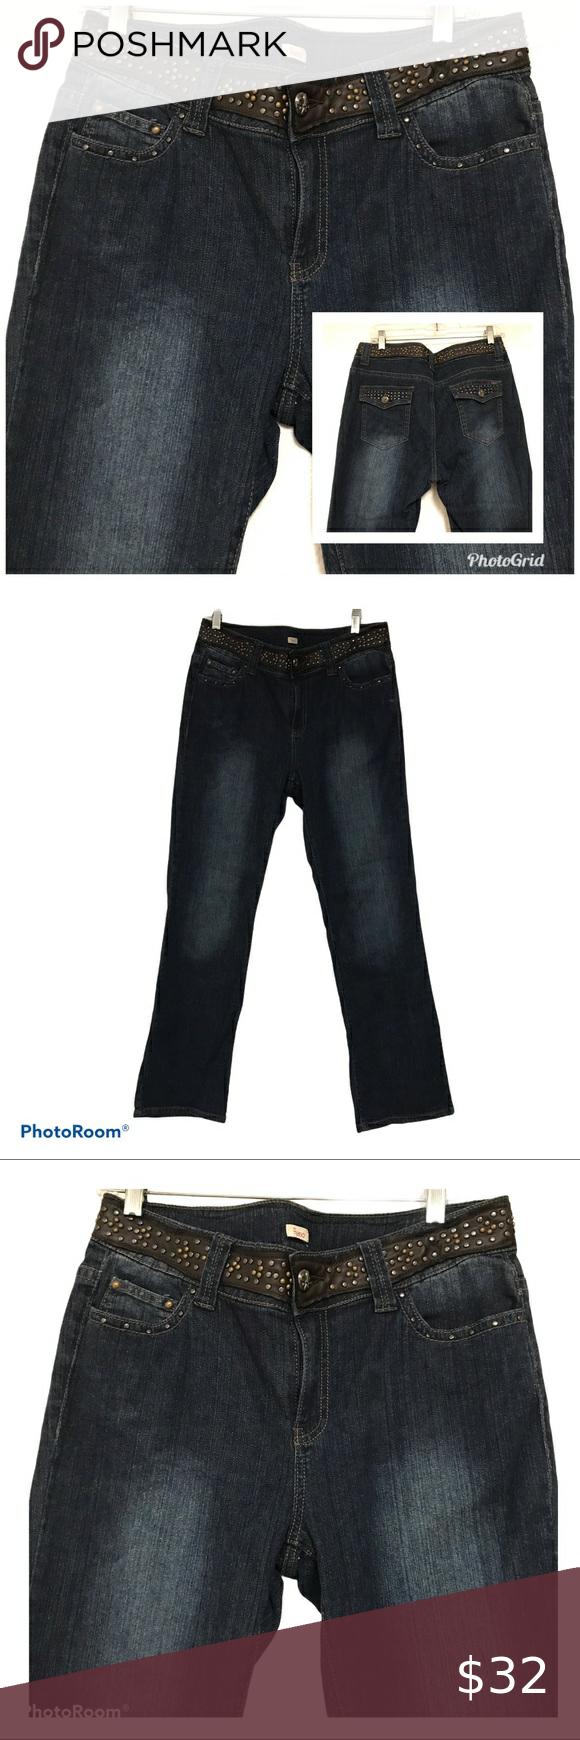 Reba Dark Blue Jean Denim Straight Leg Size 10 Dark Blue Jeans Blue Jeans Denim Jeans